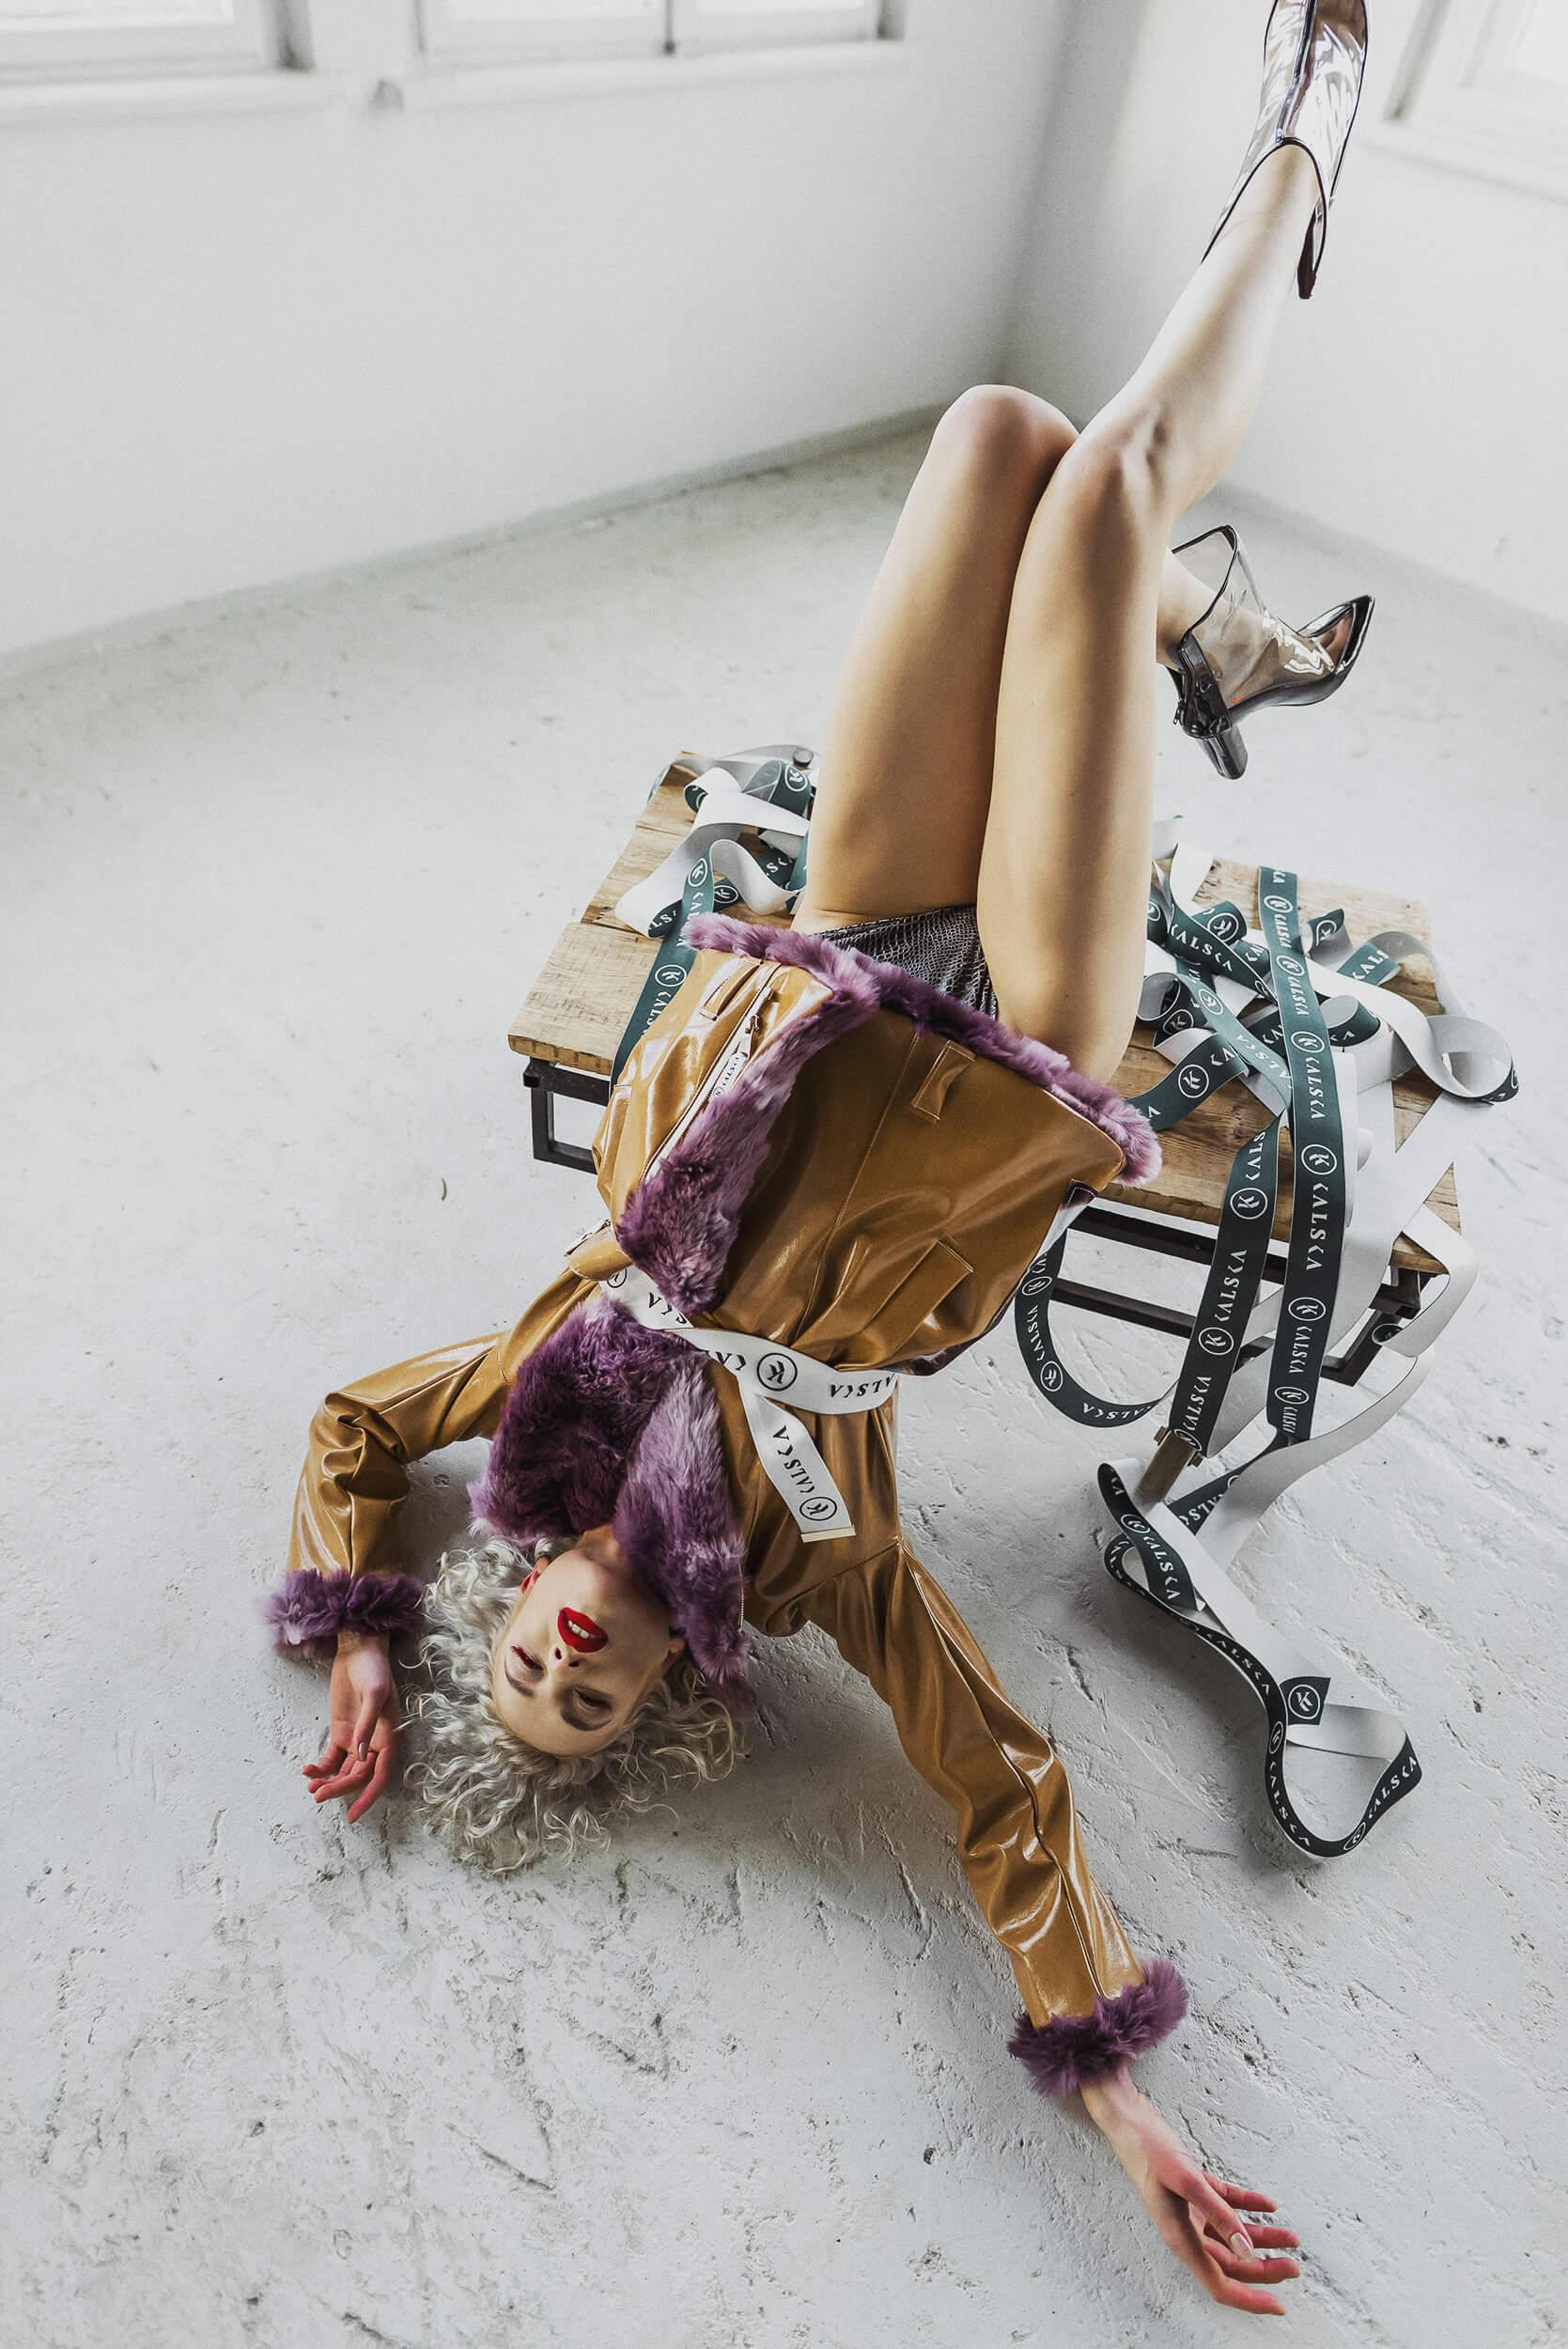 Karolina Orzechowska fotograf (11)